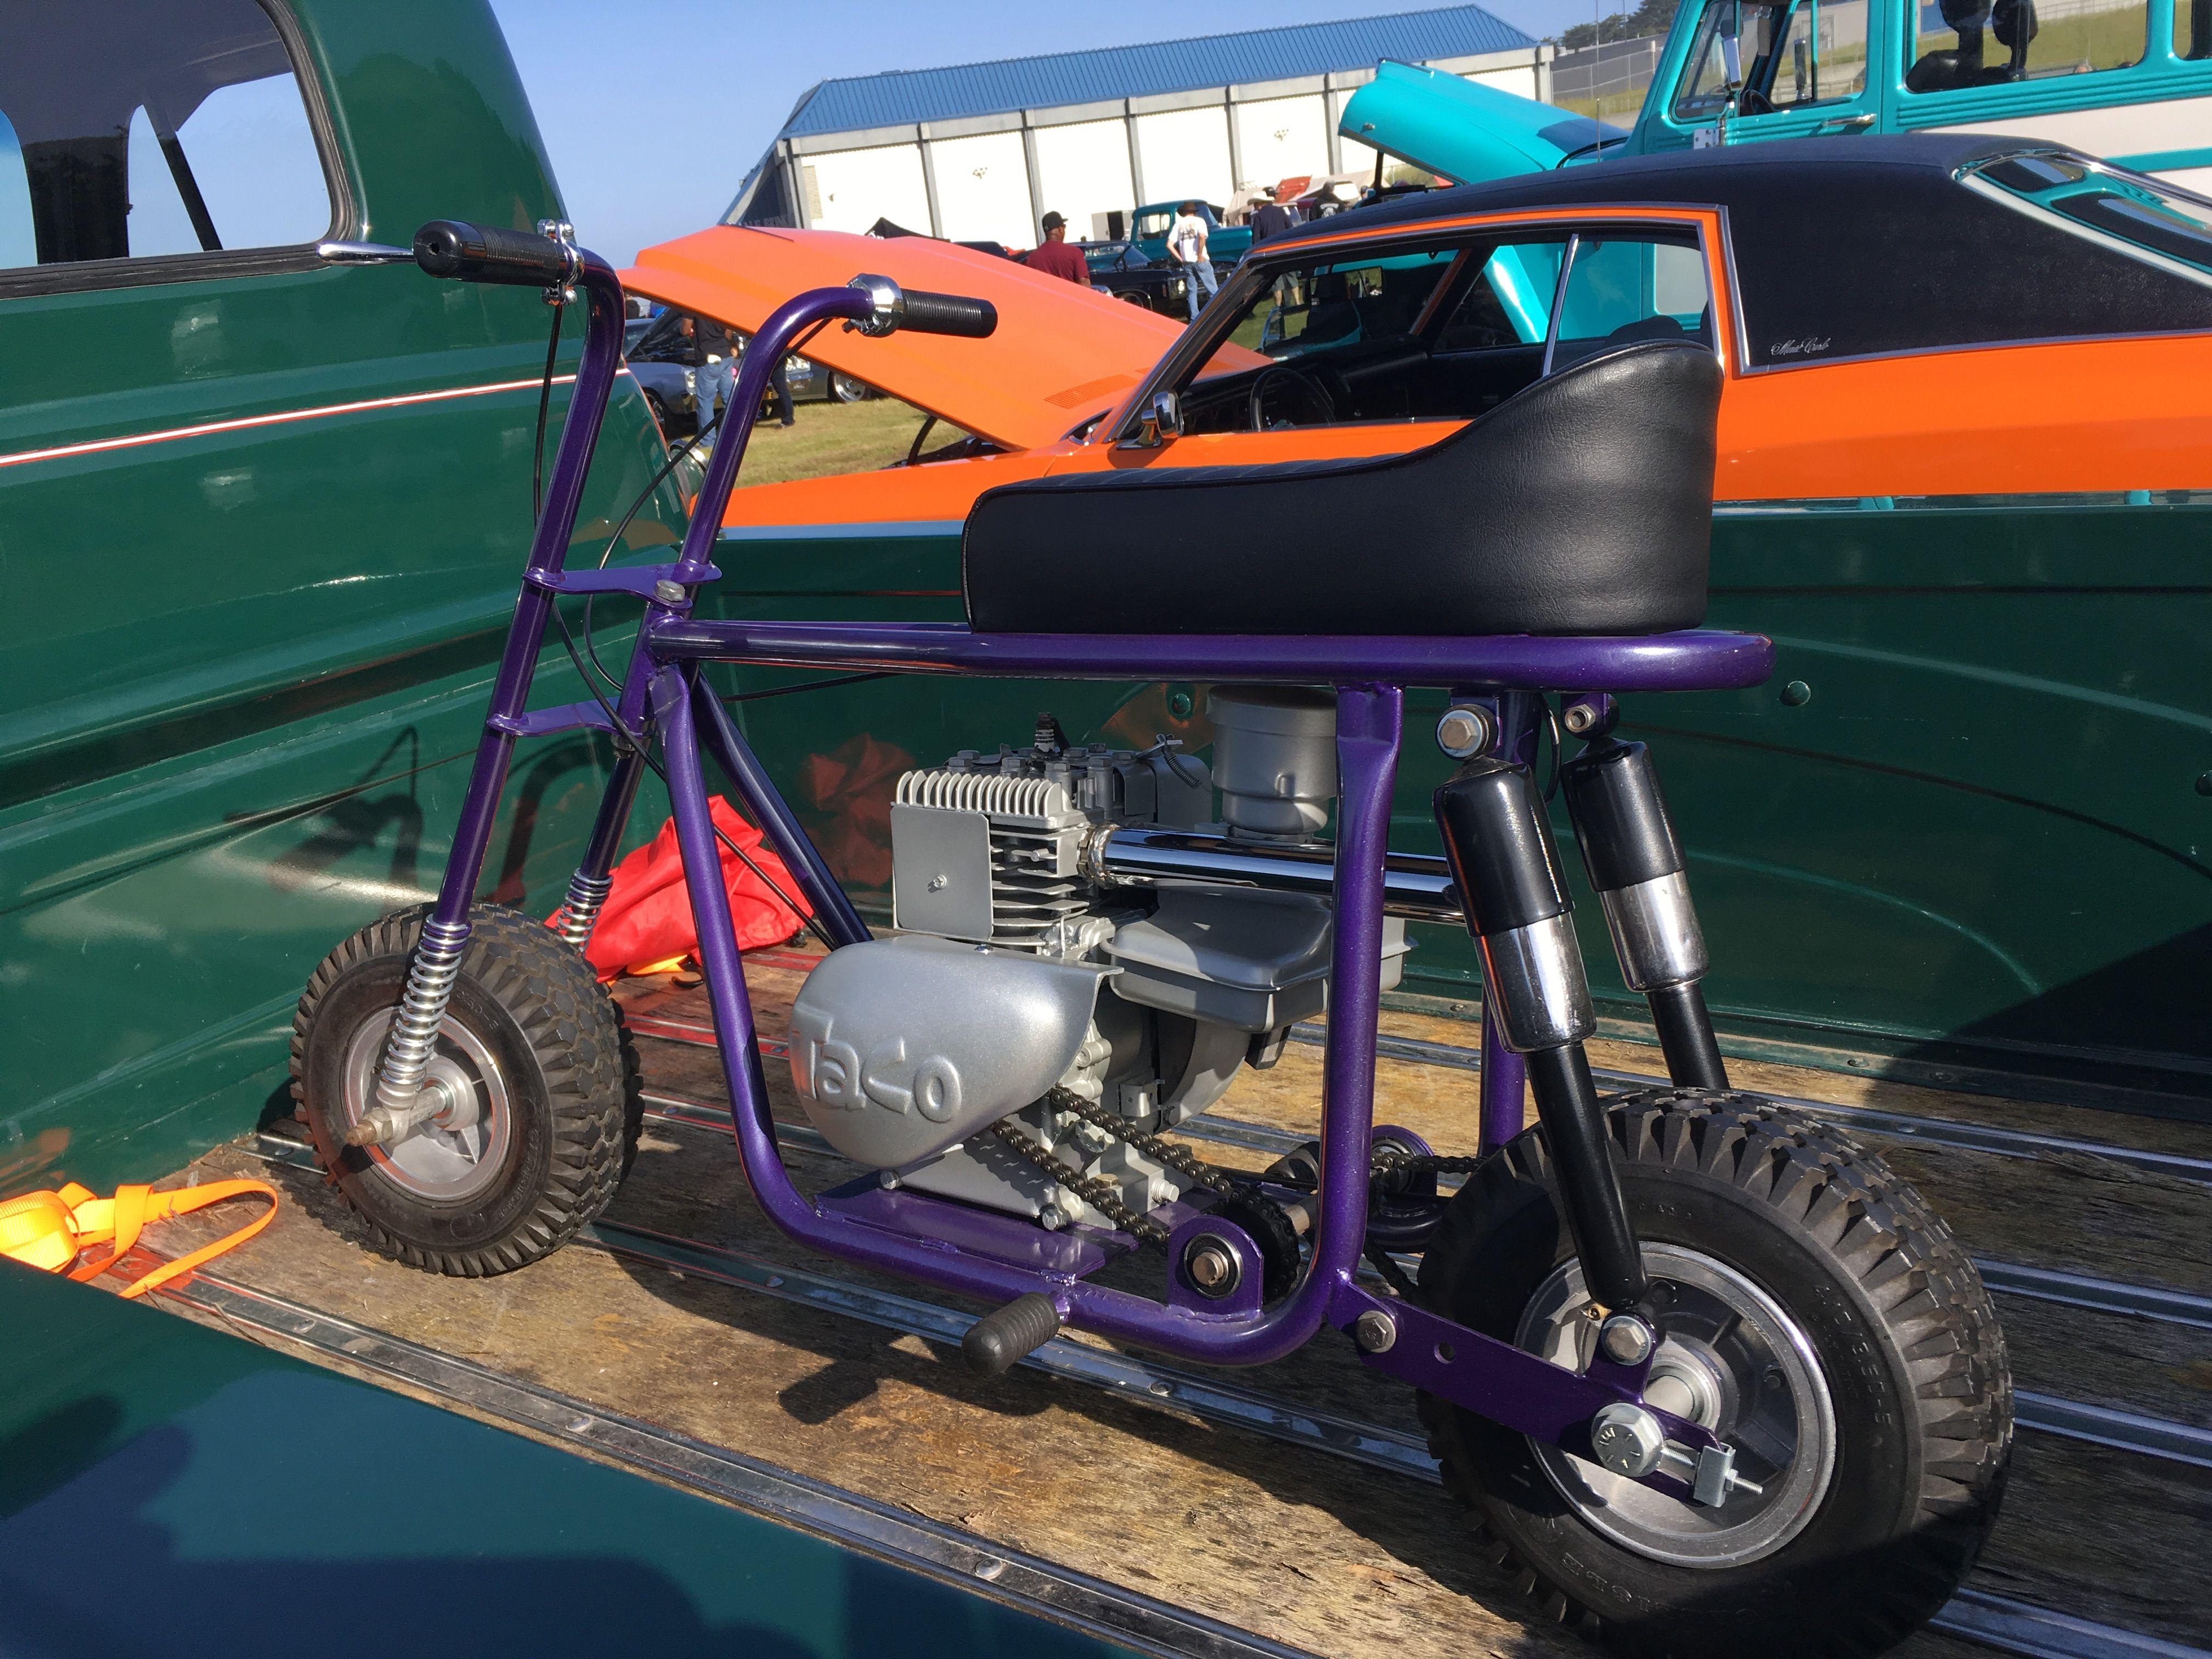 1967 Taco 44 Mini Bike Bike Motorcycle